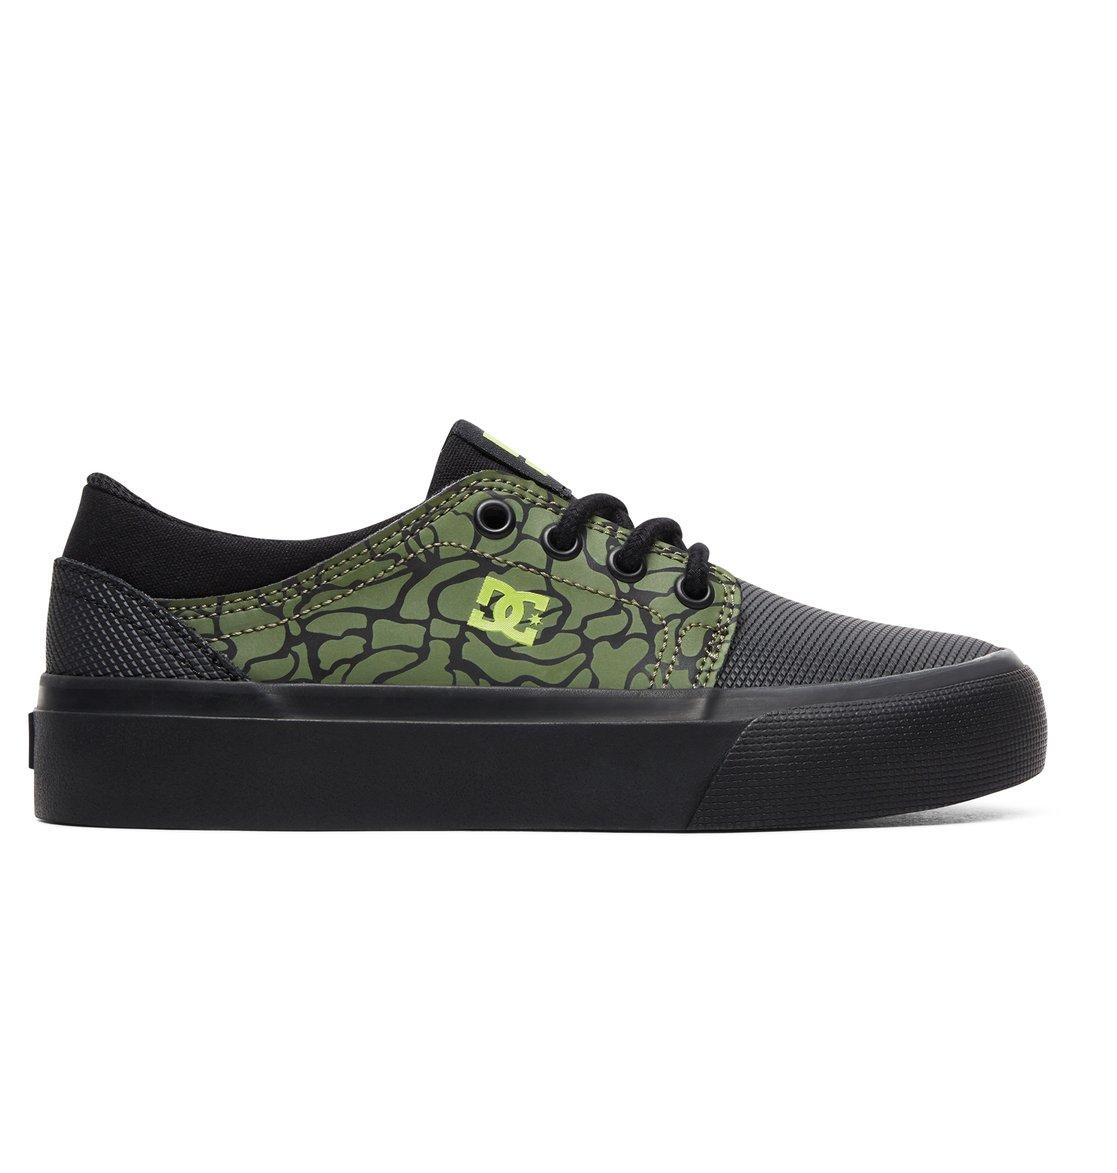 eb1990ce108 0 Trase SE - Zapatillas para Chicos Azul ADBS300264 DC Shoes